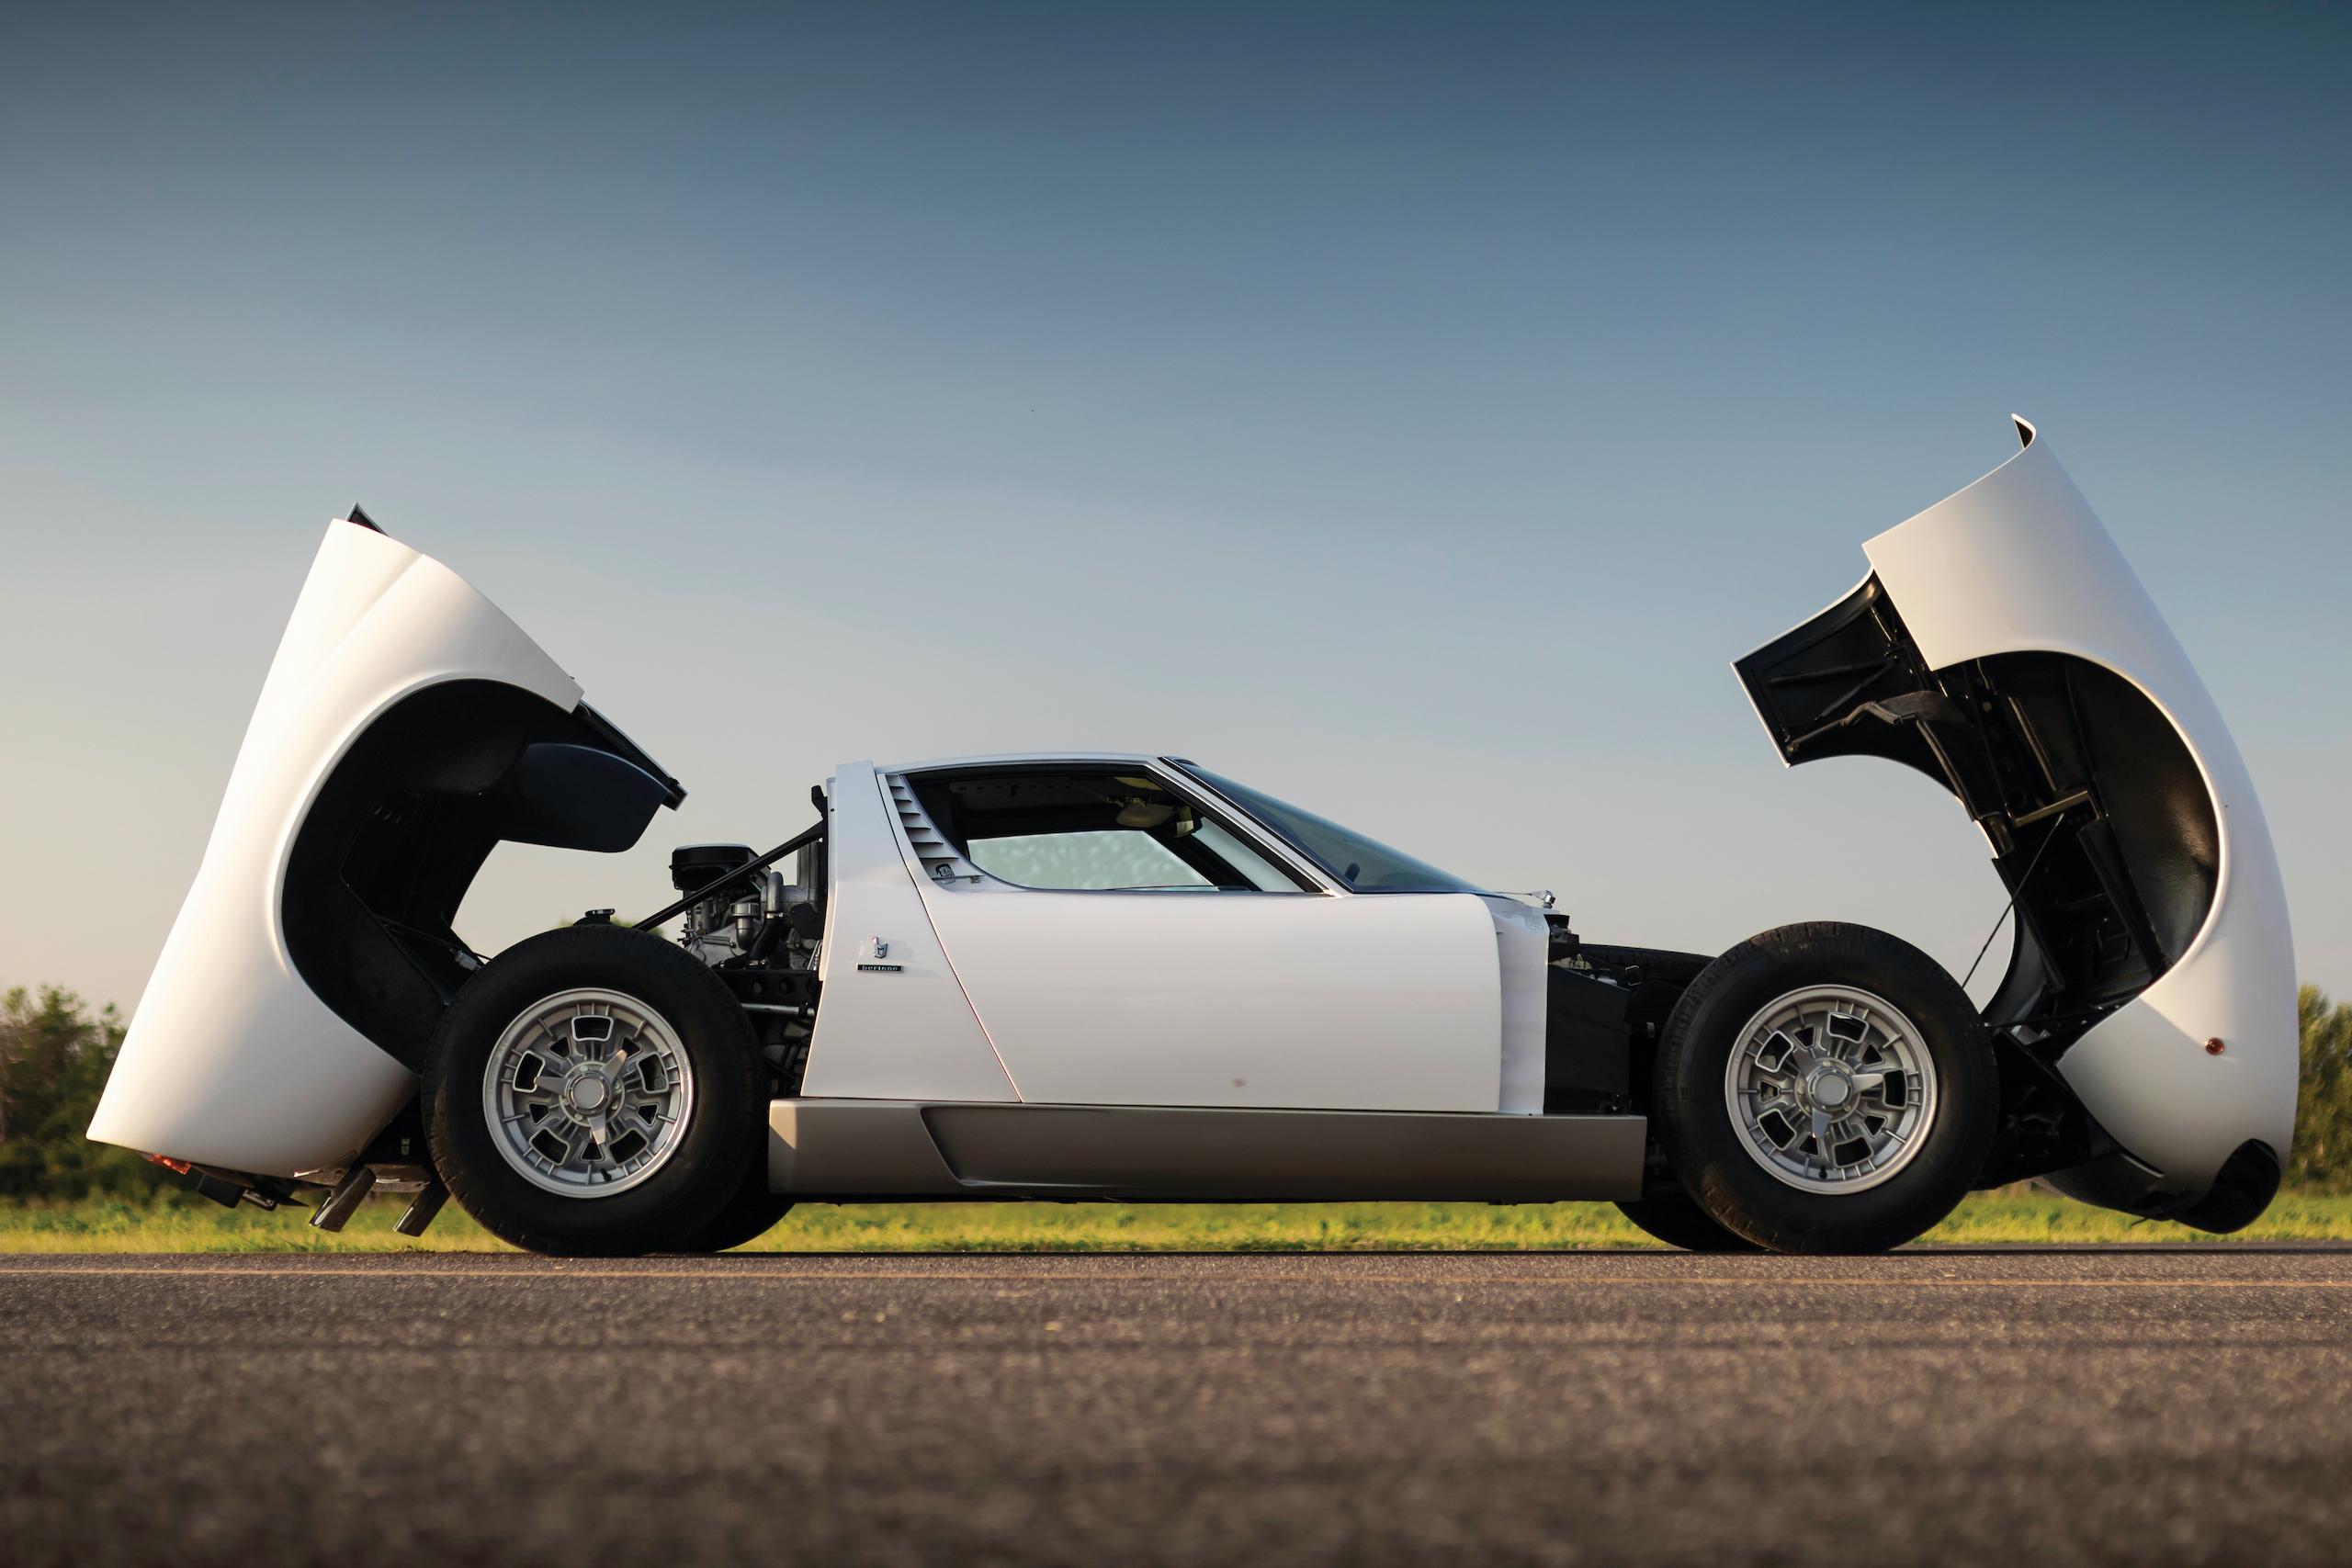 1971 Lamborghini Miura P400 S by Bertone open